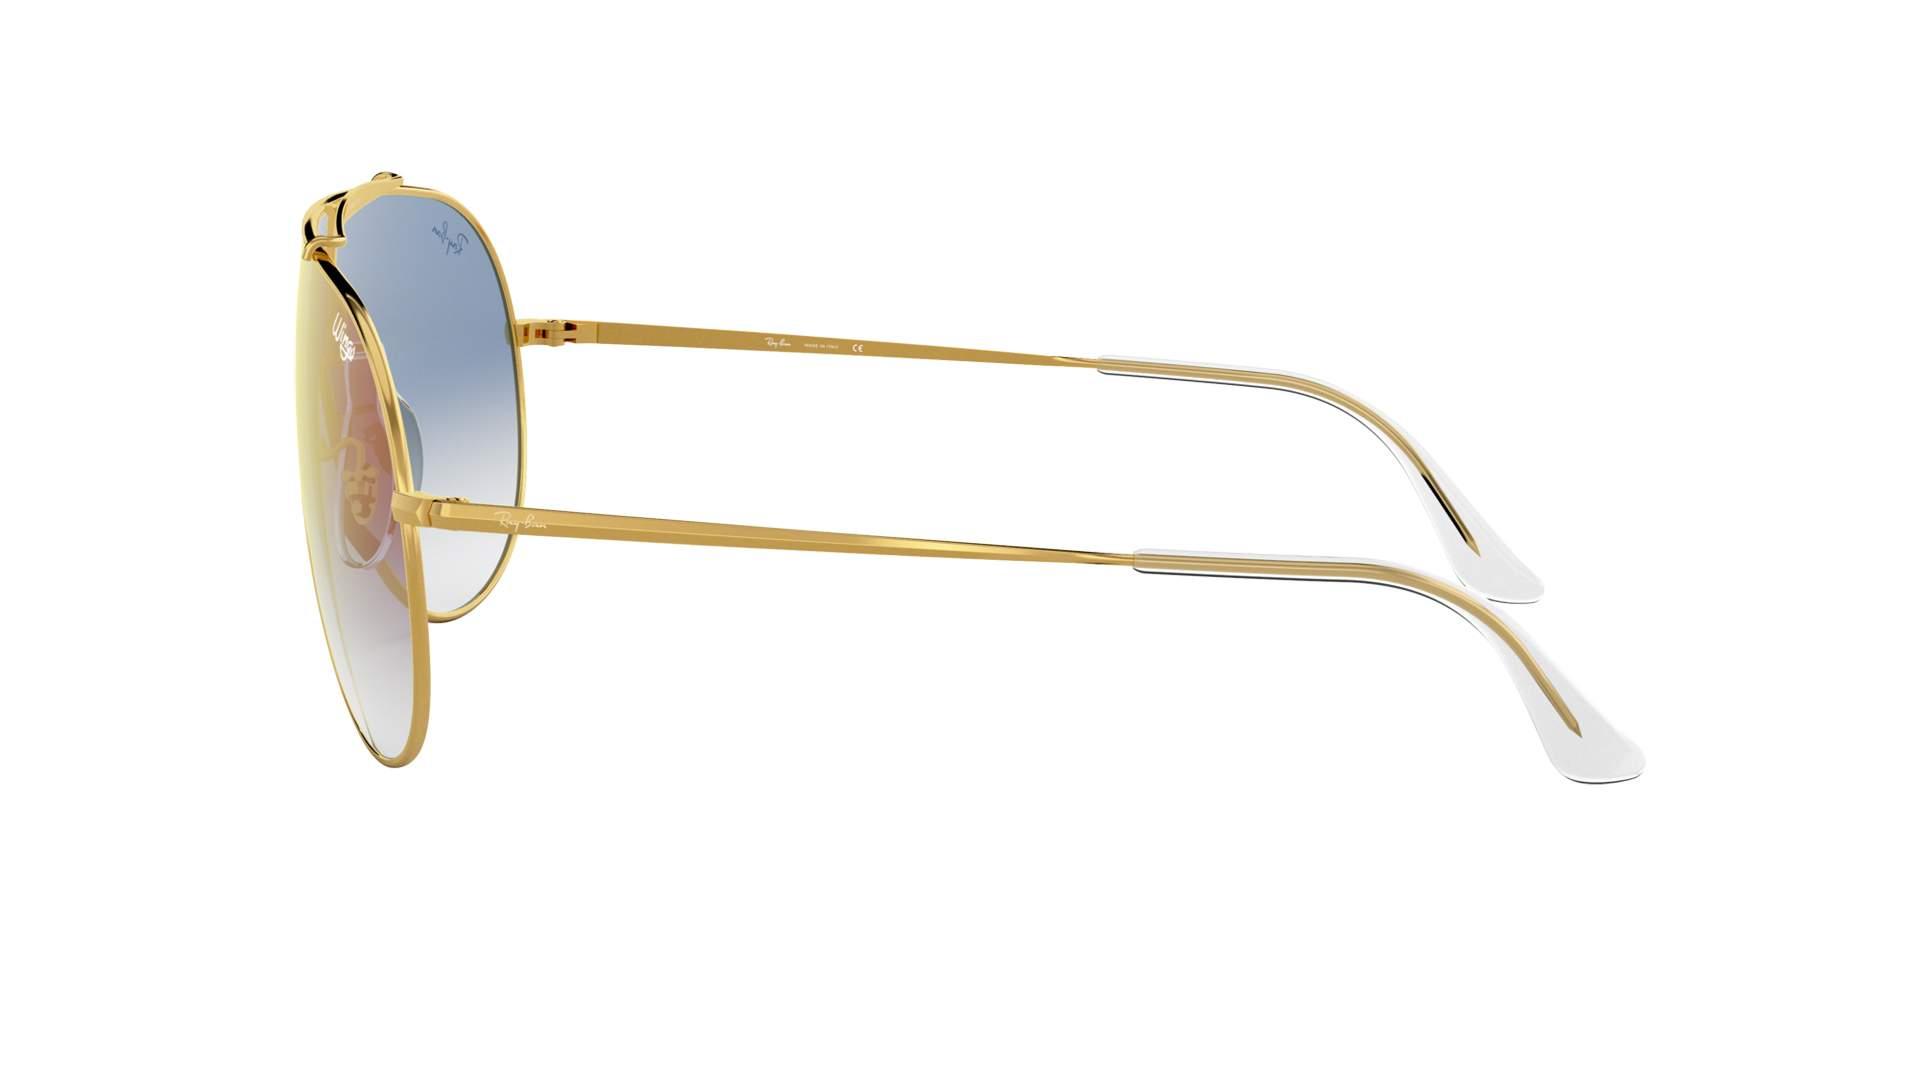 37c1bf6edc9 Sunglasses Ray-Ban Wings Gold RB3597 001 X0 33-18 Medium Gradient Mirror